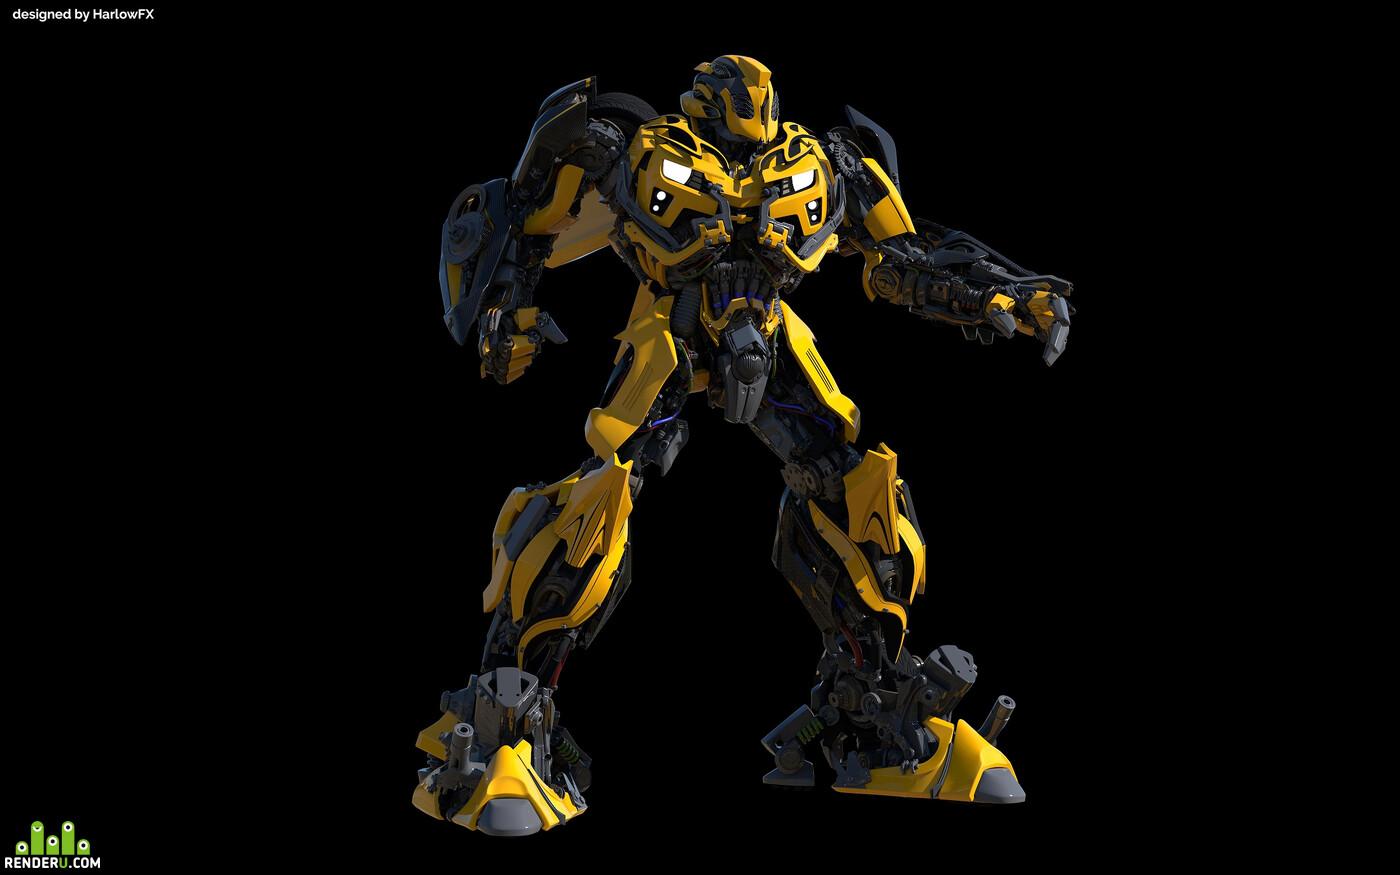 bumblebee, Transformers, TF, robot, Mecha, Autobots